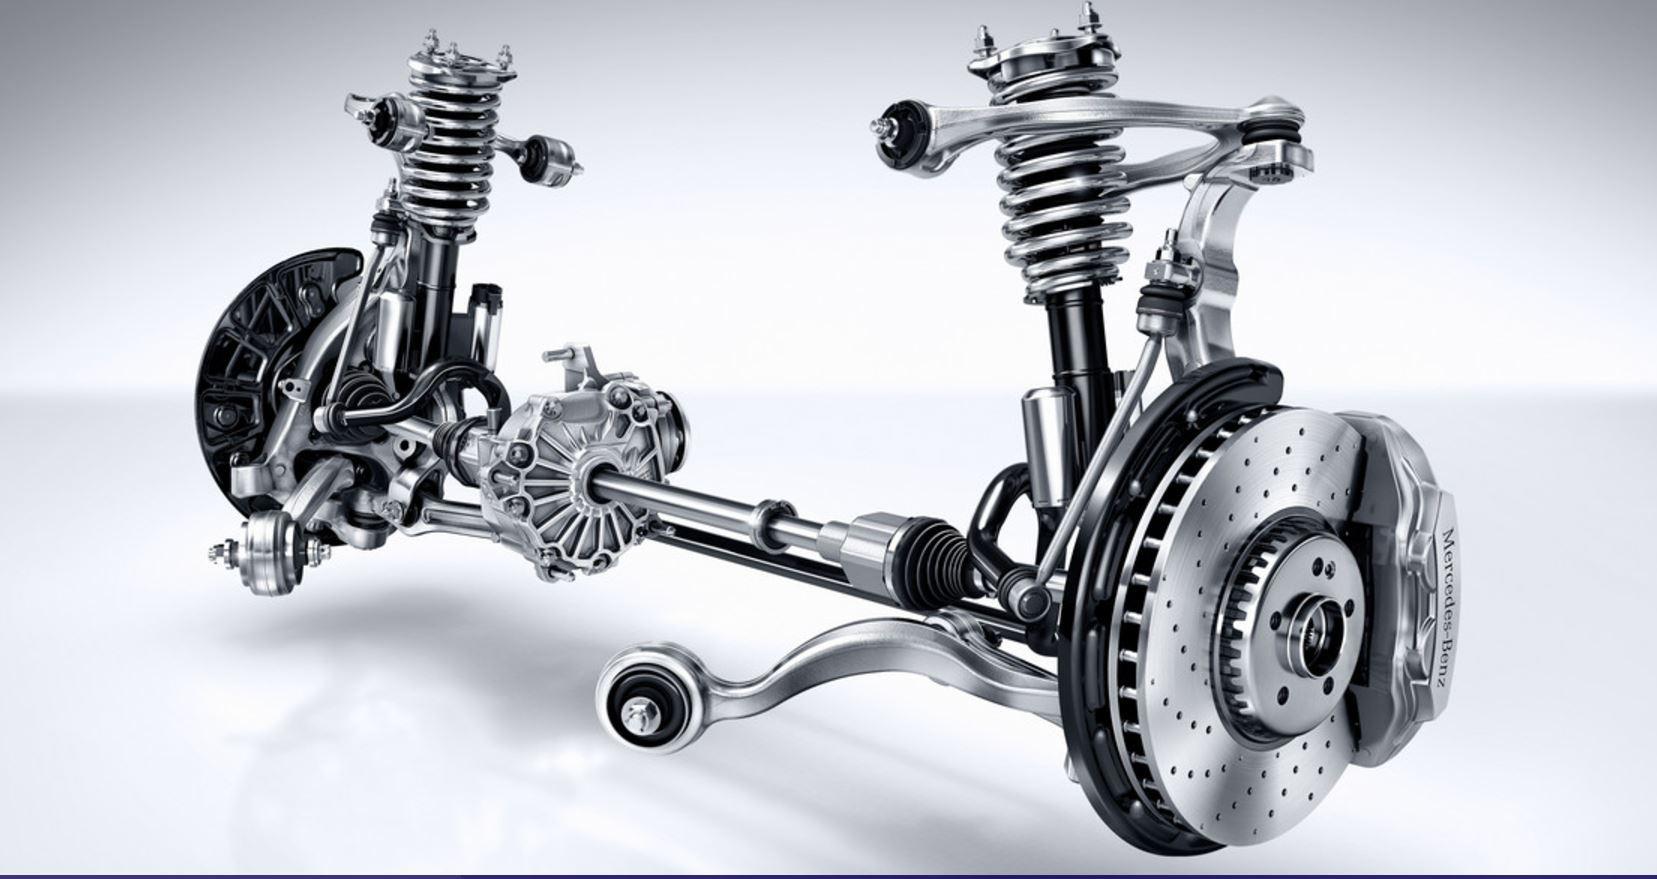 Ecs News Mercedes Benz W204 C300 C350 Front Lower Control Arms